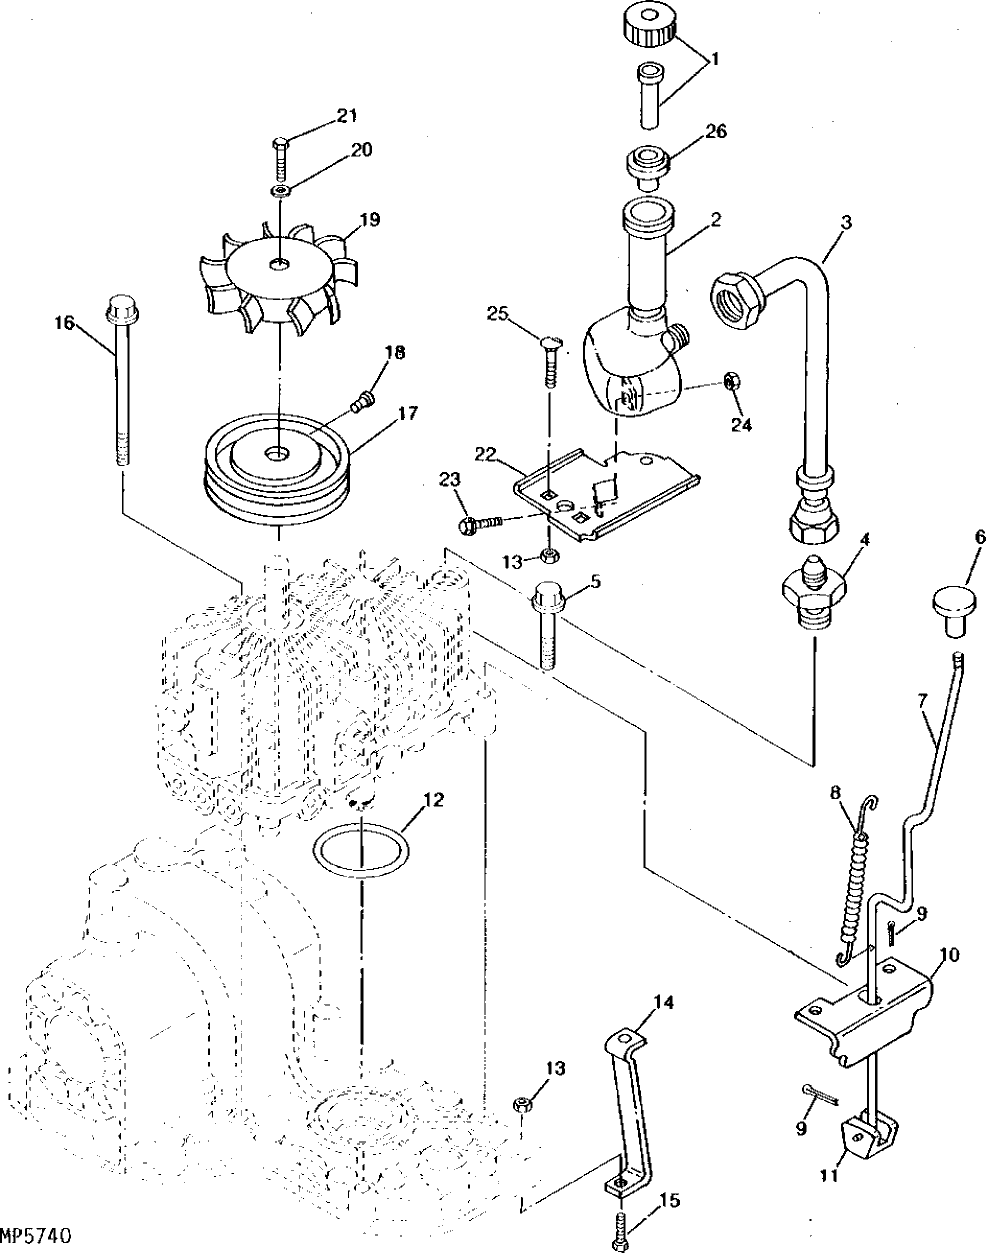 hight resolution of wiring diagram for john deere 4440